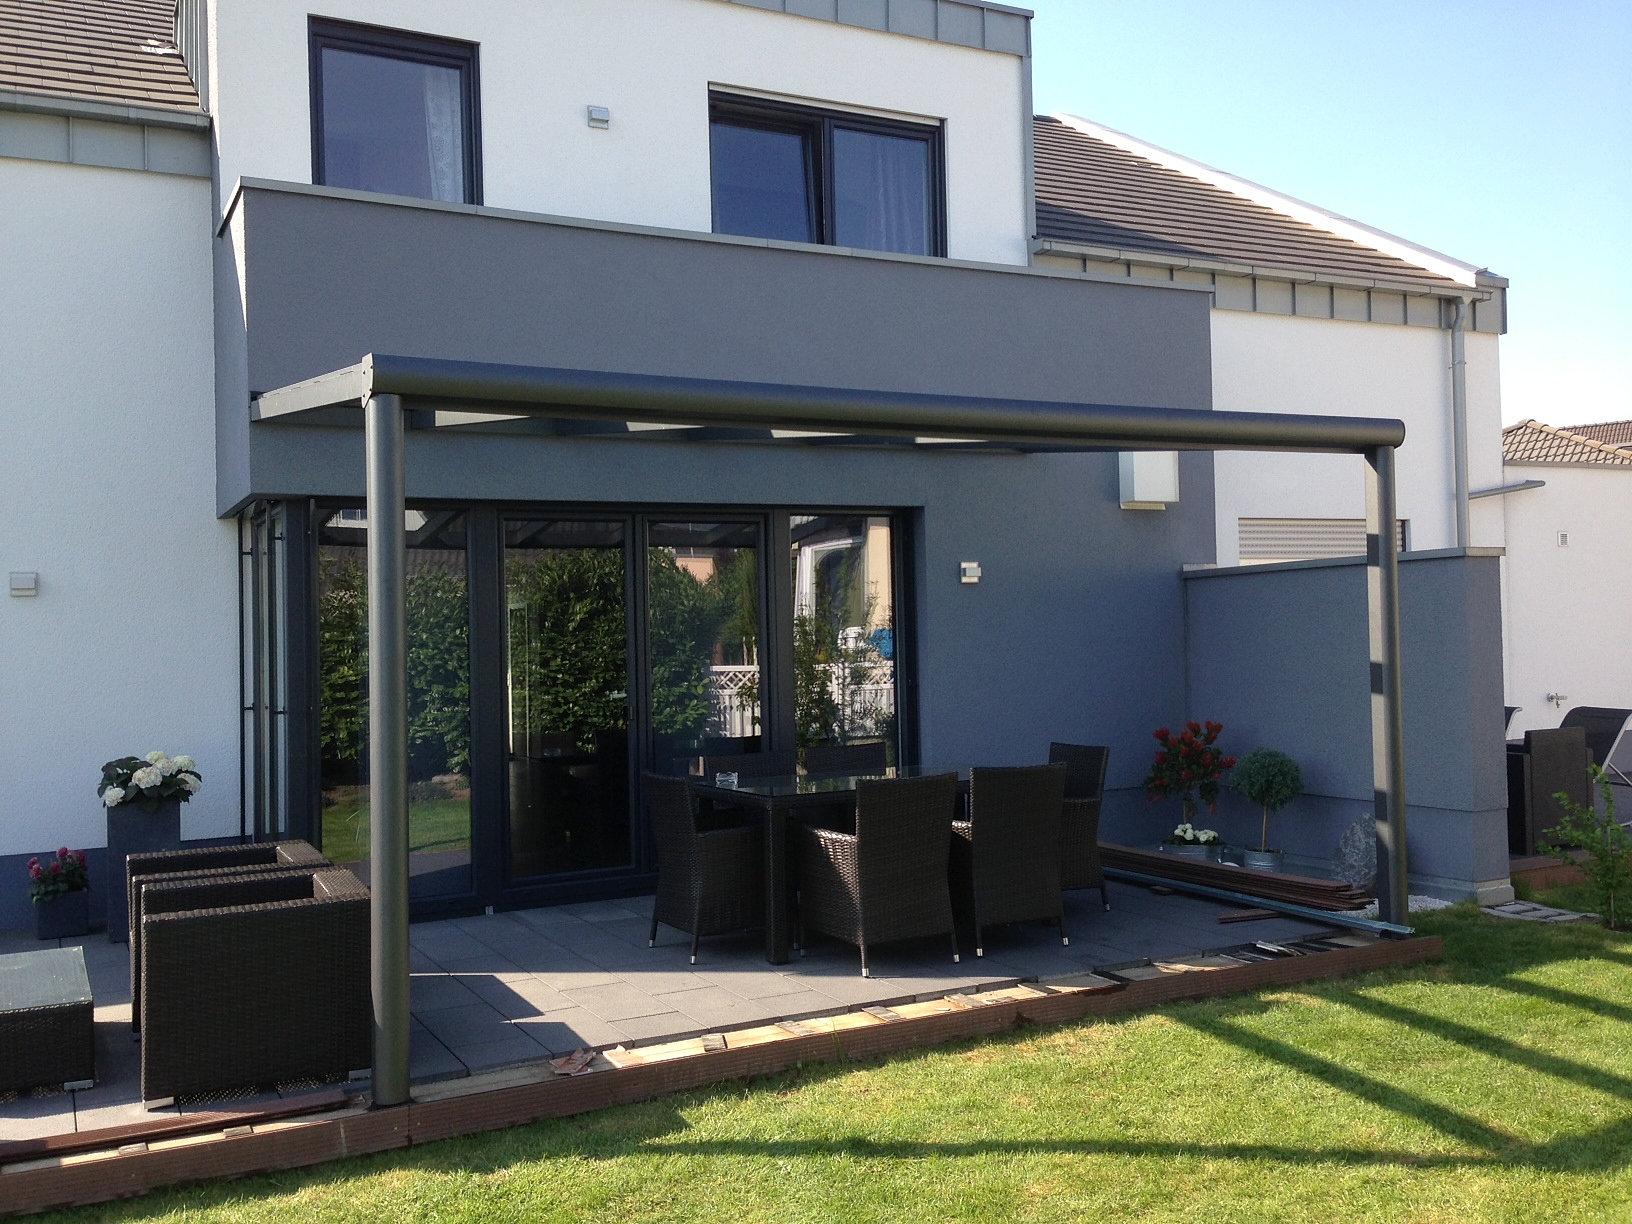 TerrassenUberdachung Holz Oder Aluminium ~ Wintergarten und Terrassenüberdachungen,Terrassendach Angebote Preise